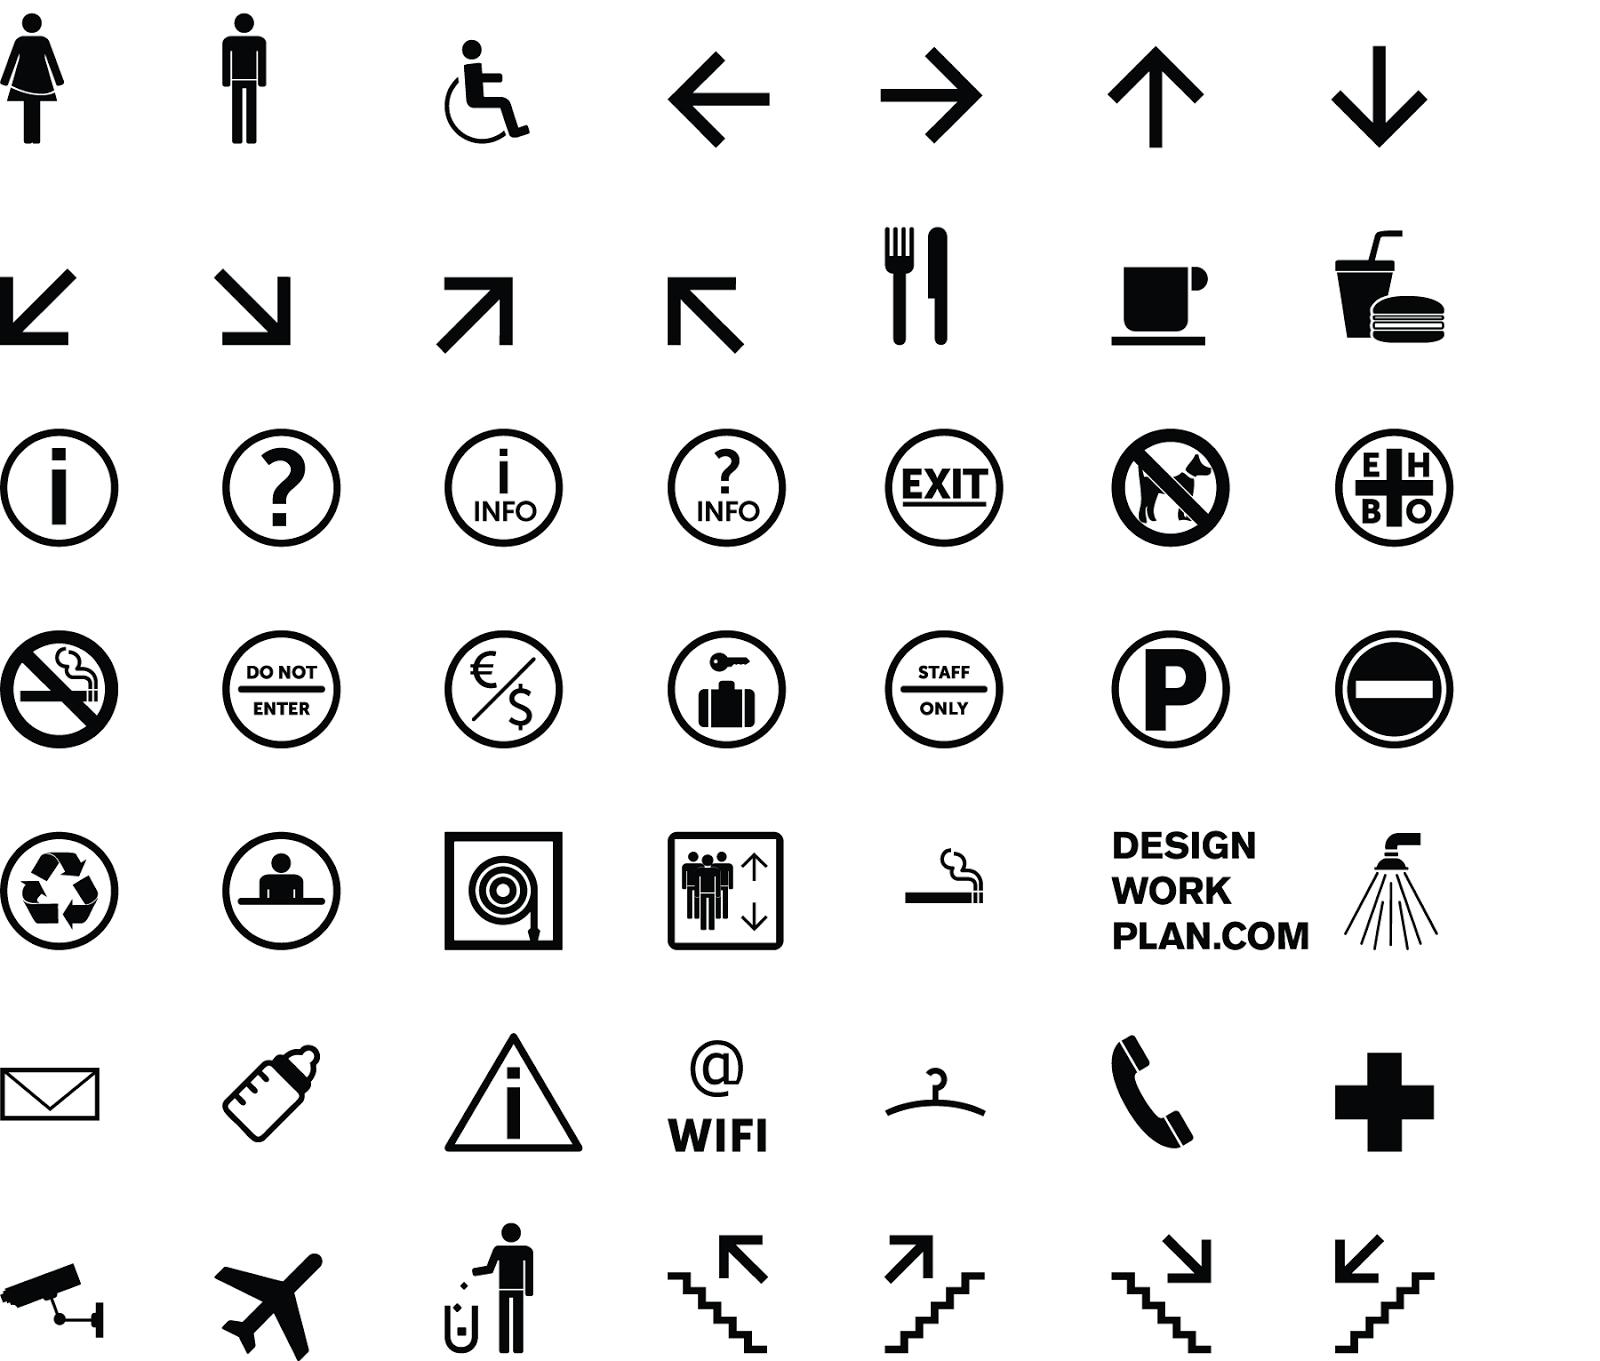 symbol alt 0169 copyright symbol alt 0174 registered trademark symbol